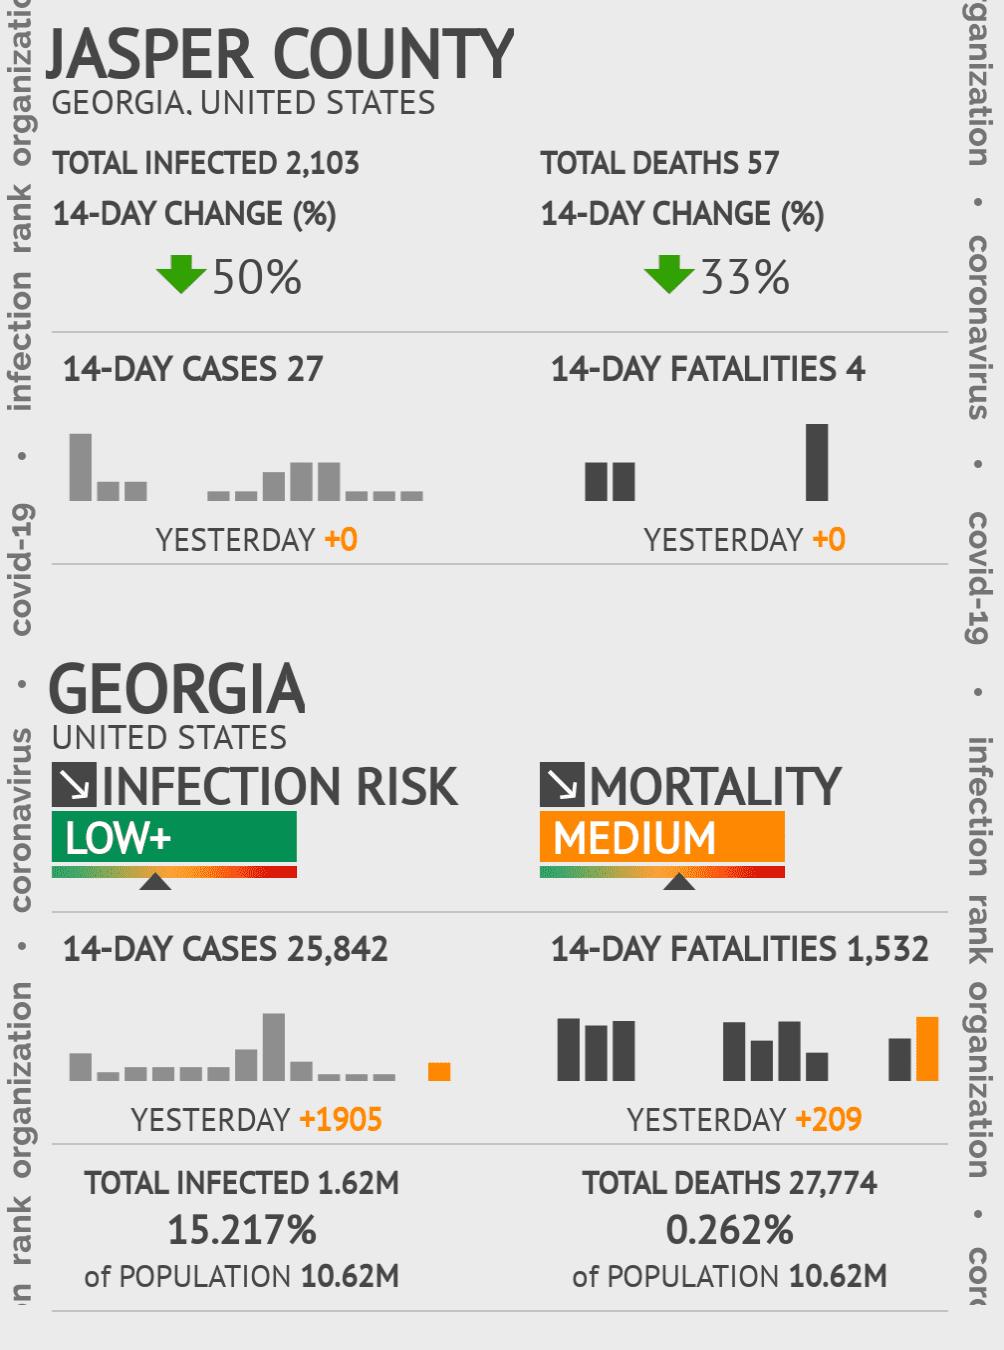 Jasper County Coronavirus Covid-19 Risk of Infection on March 23, 2021